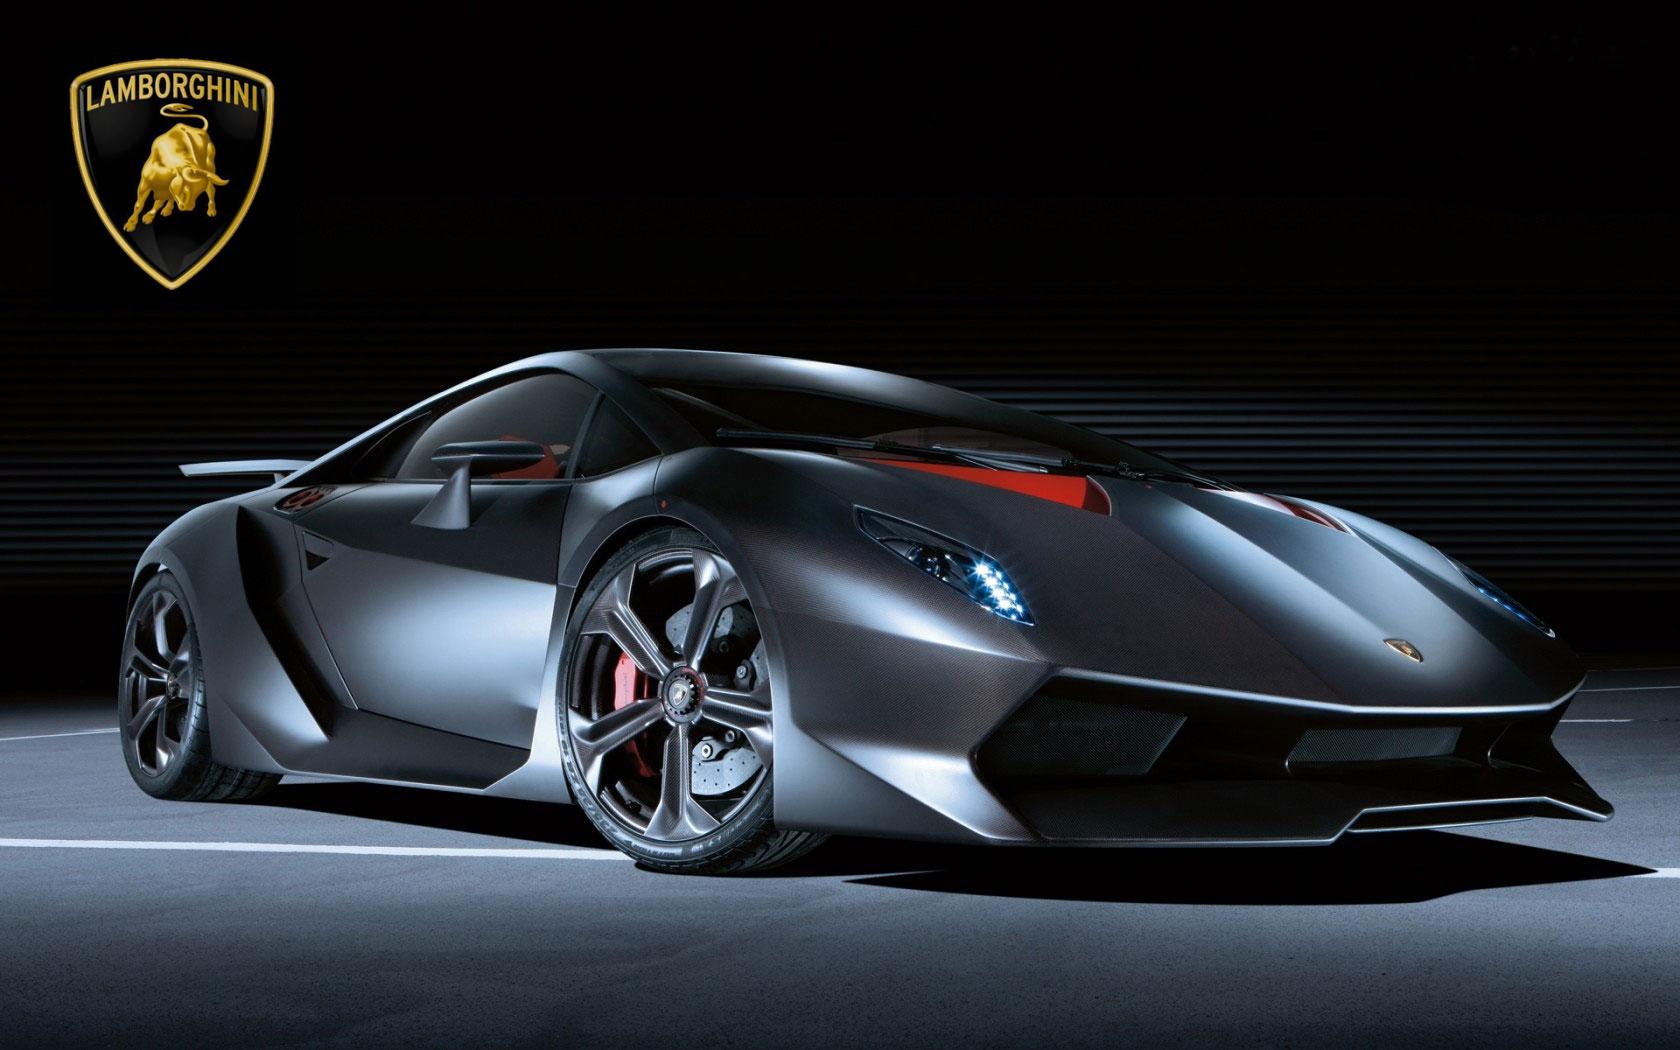 Lamborghini Backgrounds Desktop Important Wallpapers 1680x1050